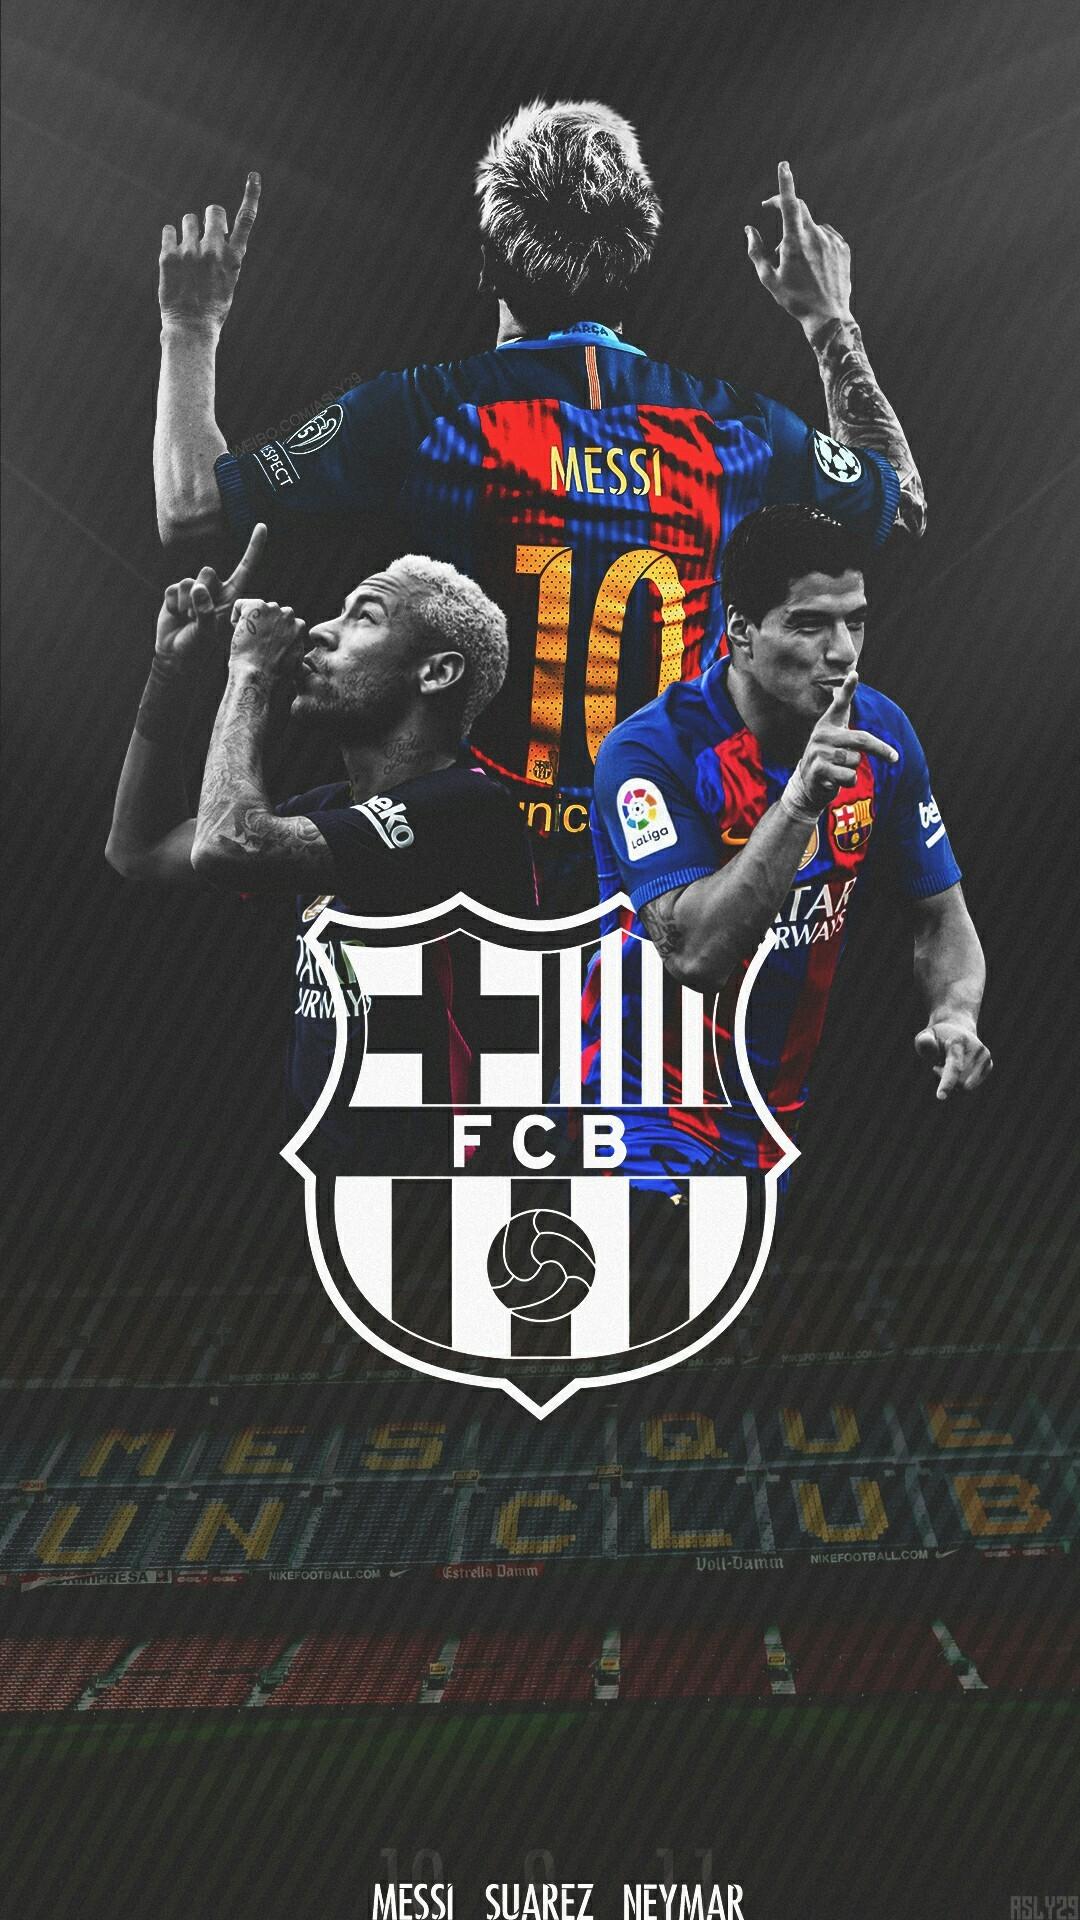 Barcelona Wallpaper Hd 2017 >> Messi Neymar Suarez Wallpaper (90+ images)